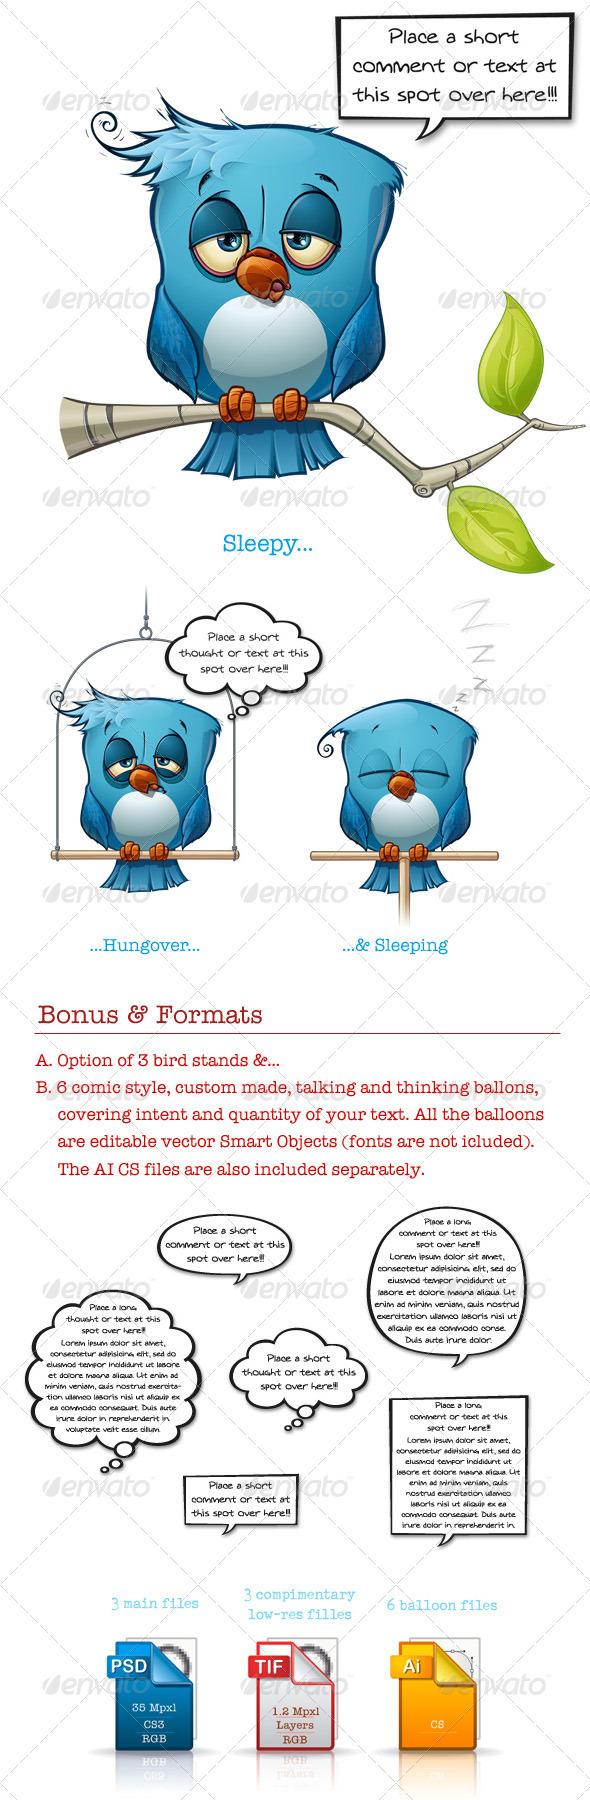 Blue Bird Sleepy-Hangover-Sleeping - Animals Illustrations